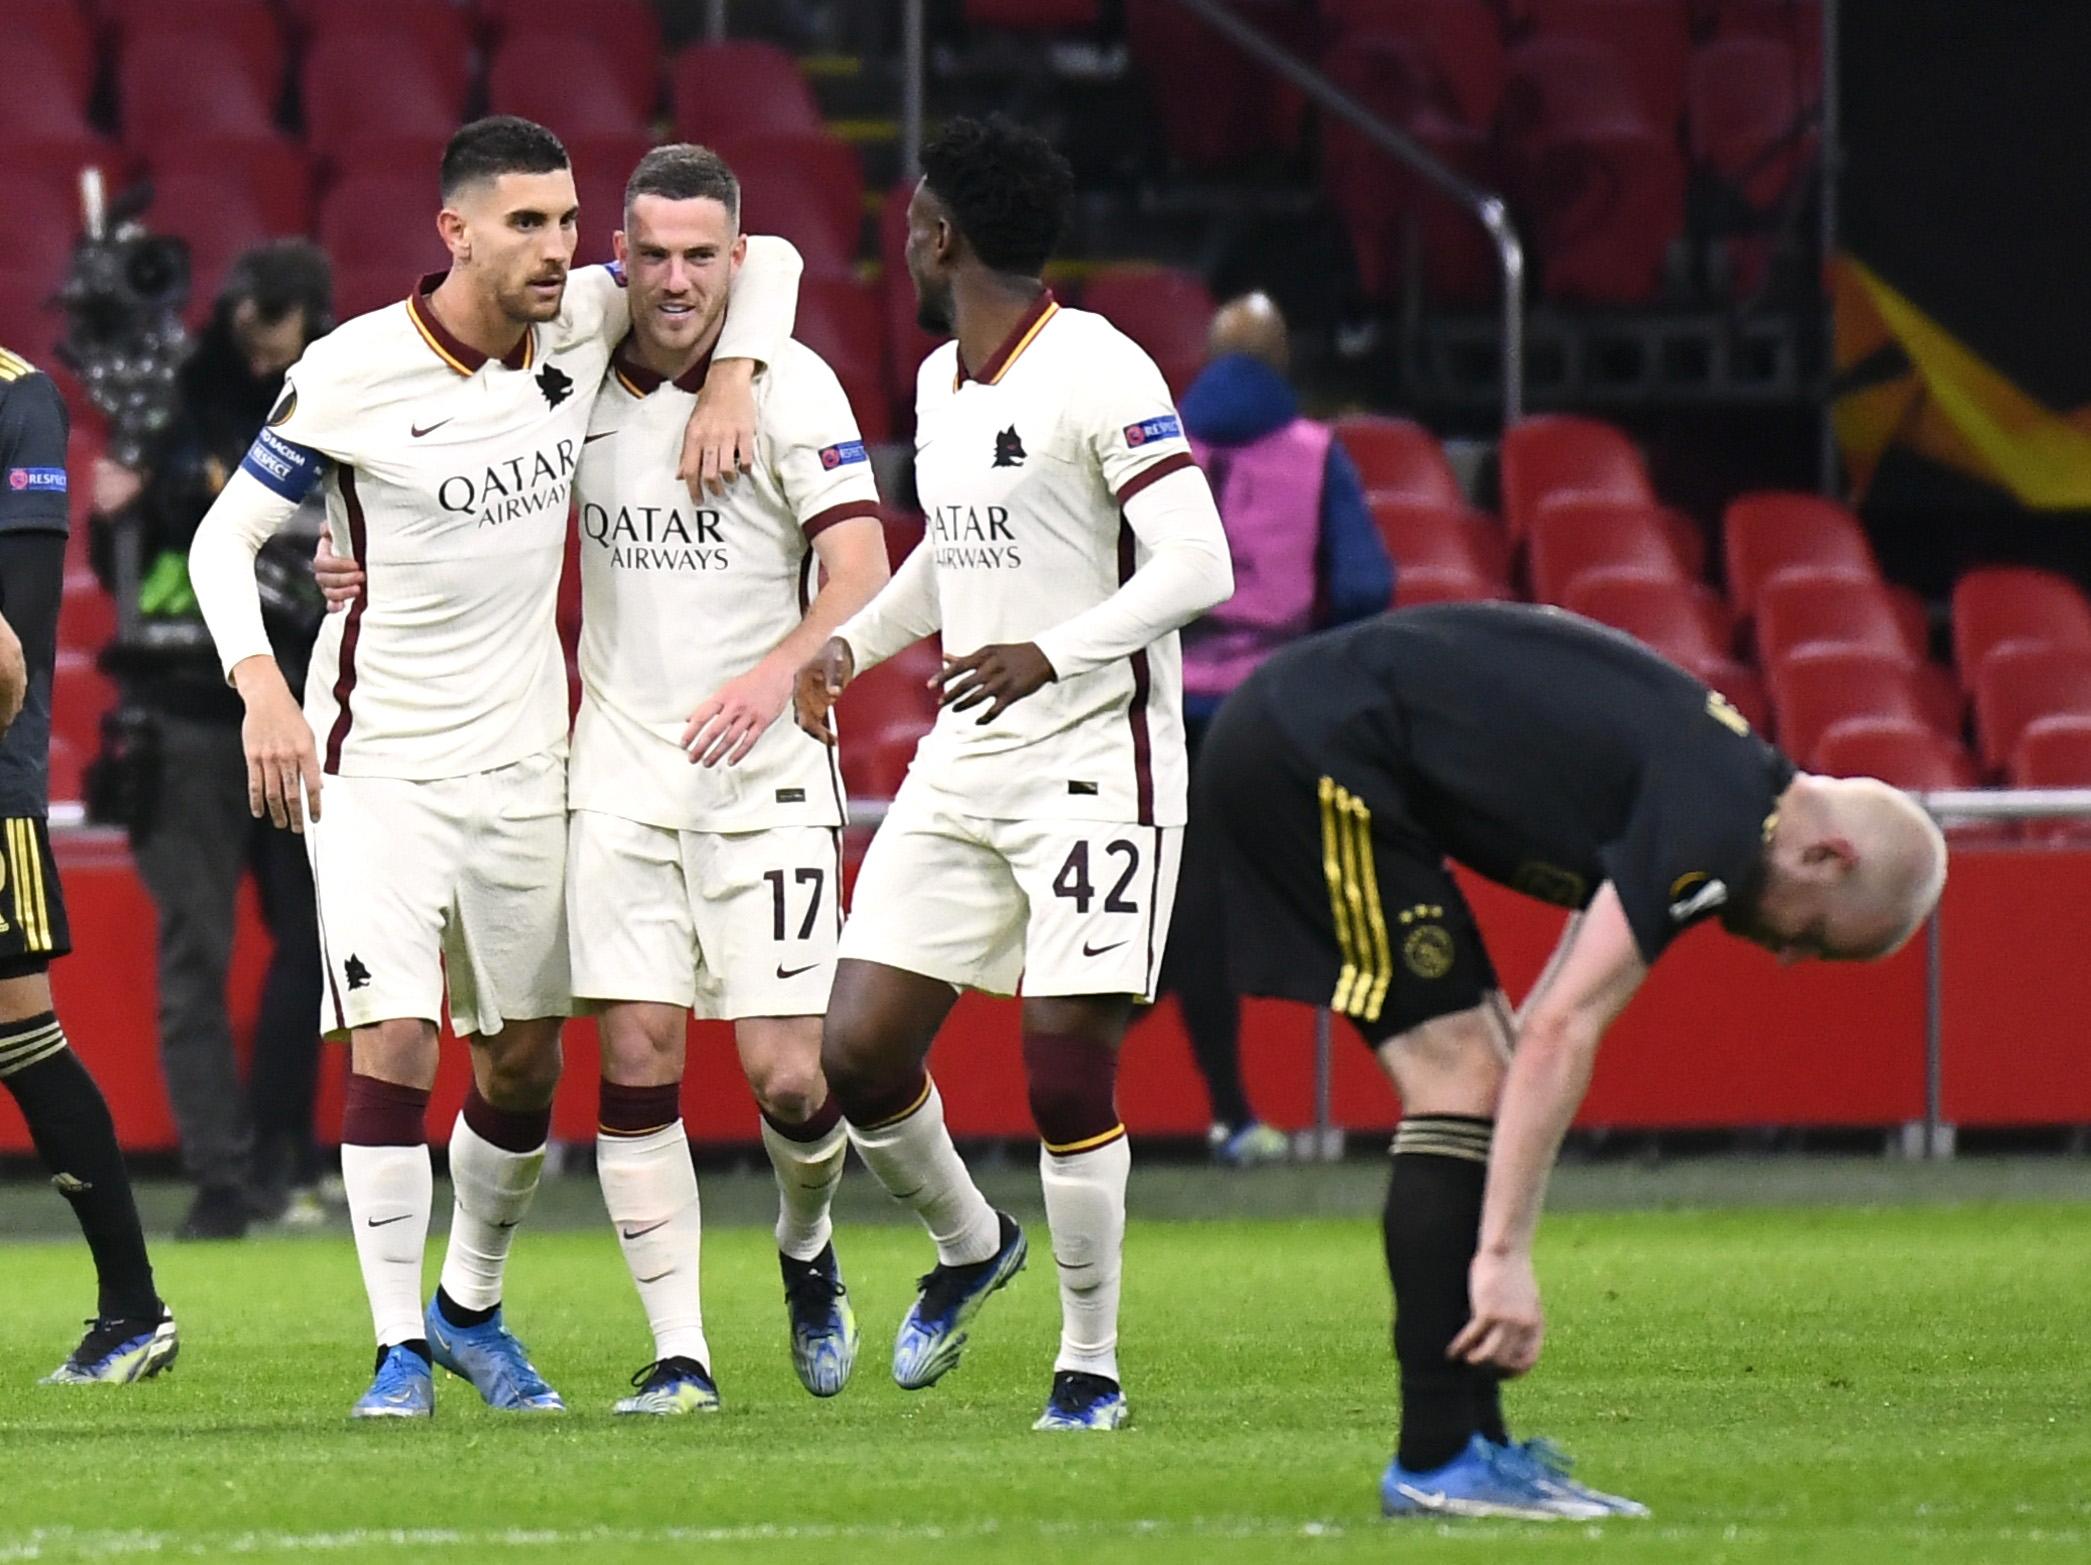 Europa League: «Έμφραγμα» για Άρσεναλ, ανατροπή πρόκρισης η Ρόμα – Όλα τα γκολ (videos)